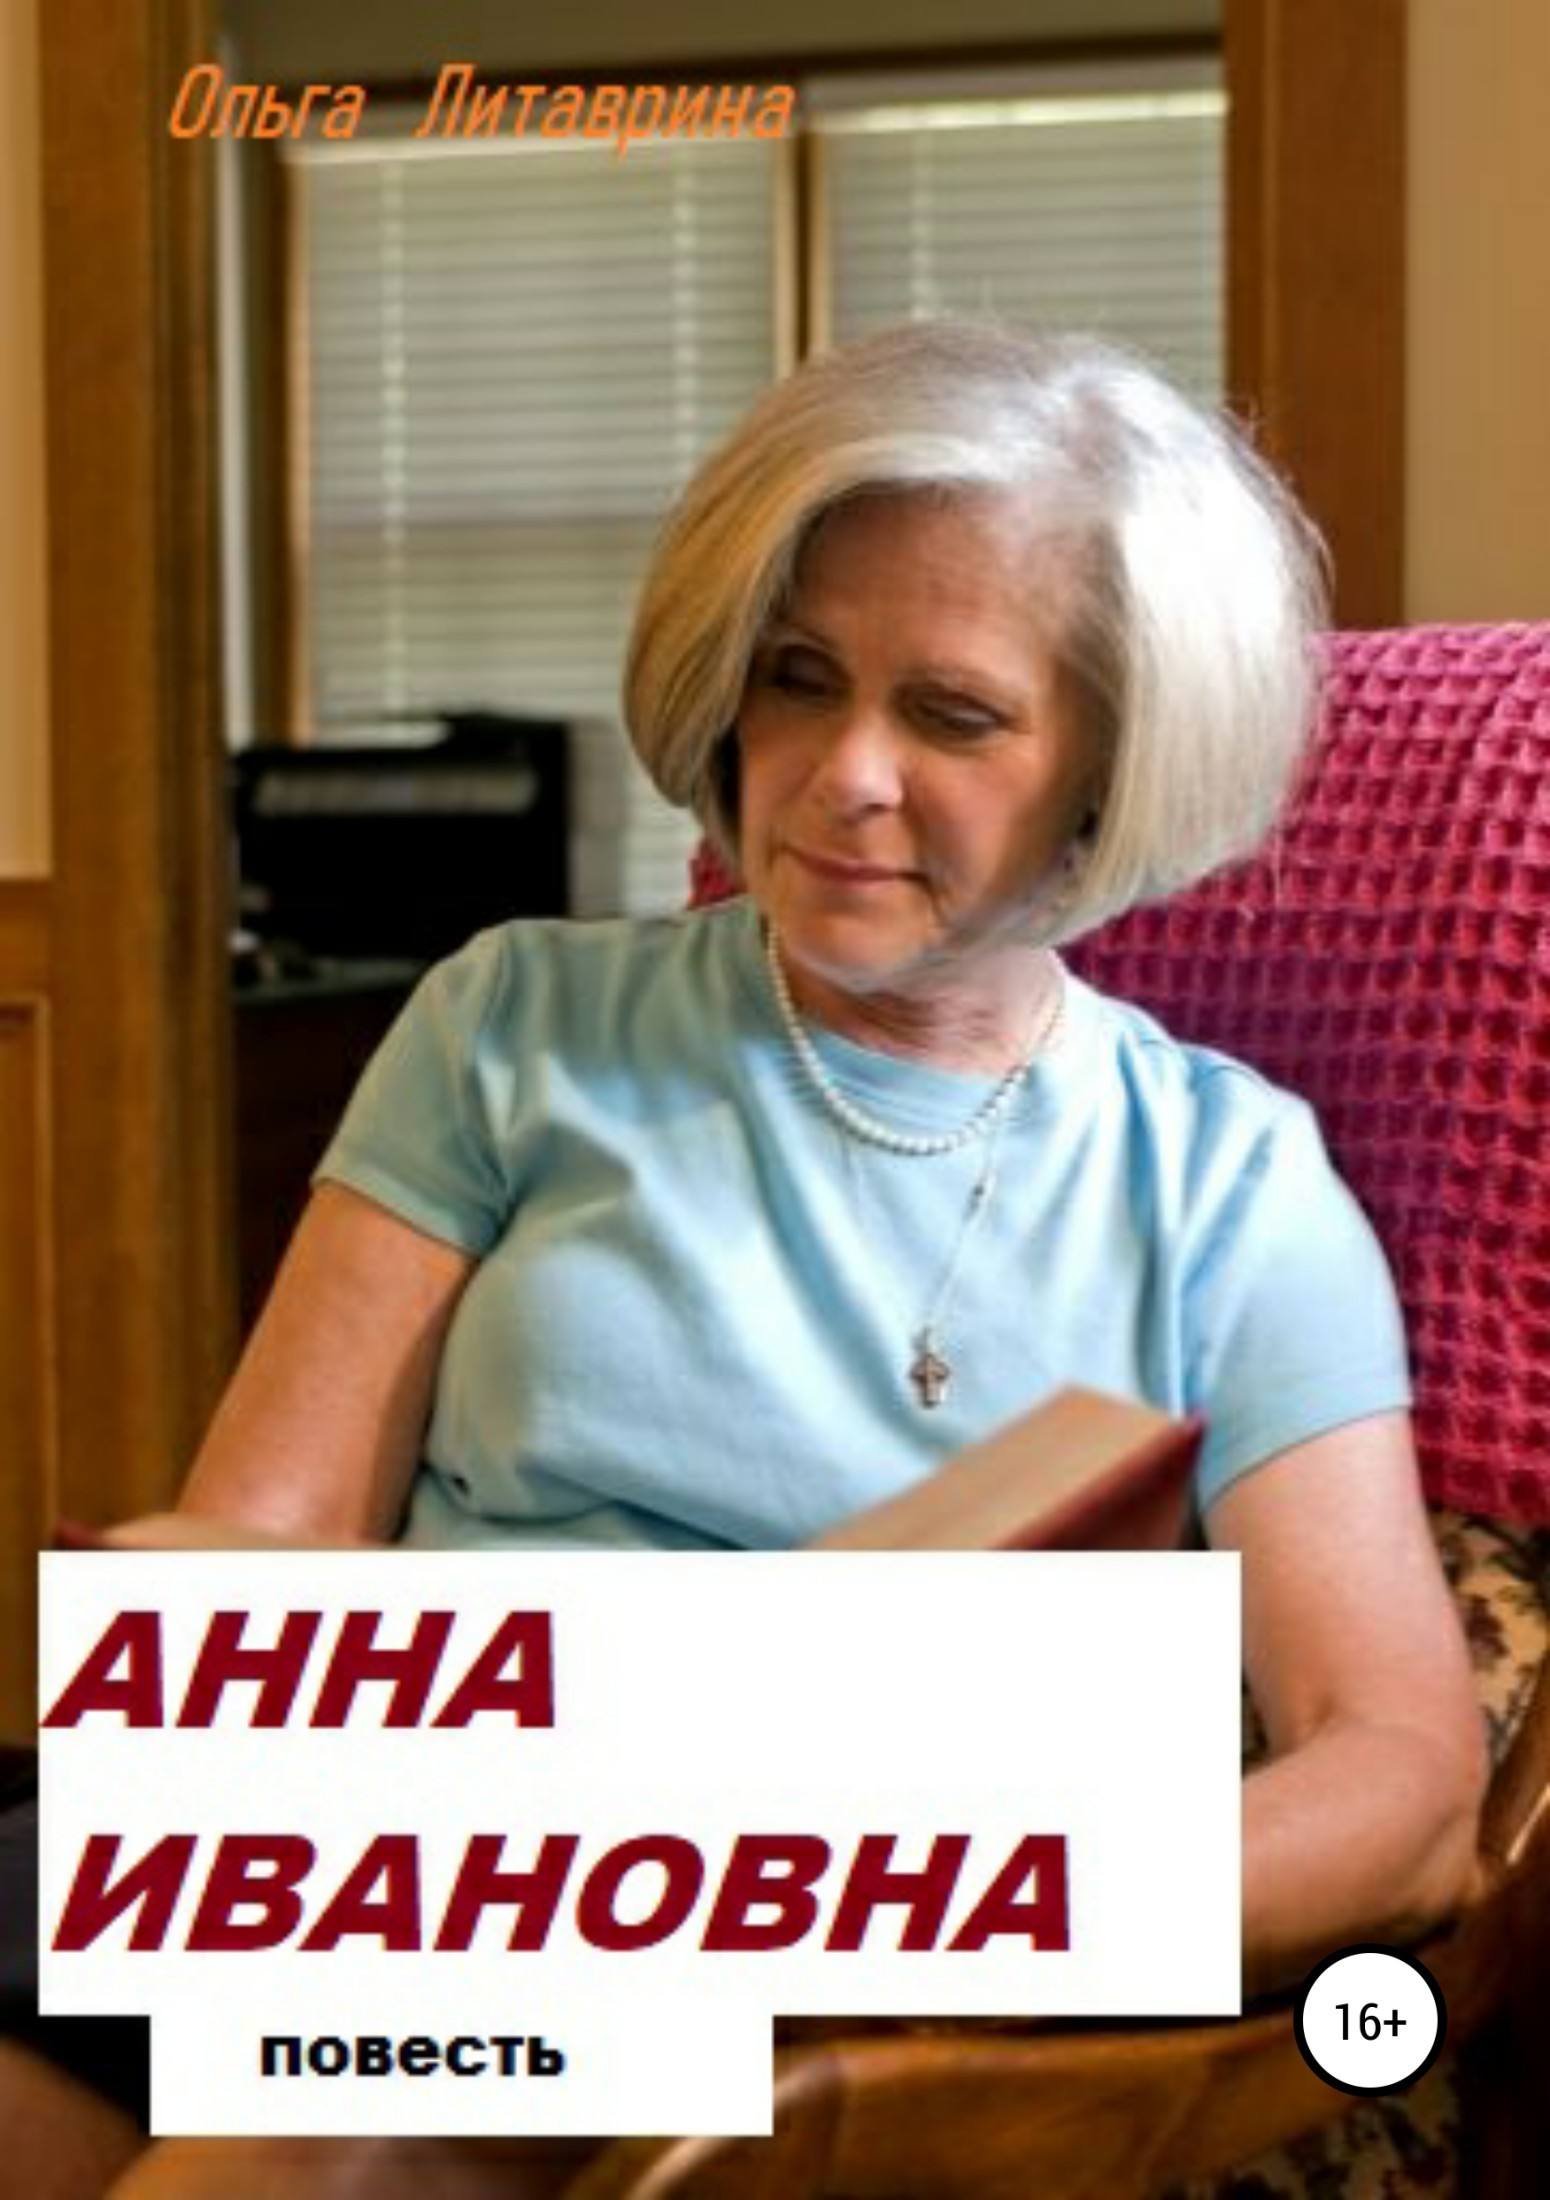 Ольга Борисовна Литаврина-Махнева Анна Ивановна